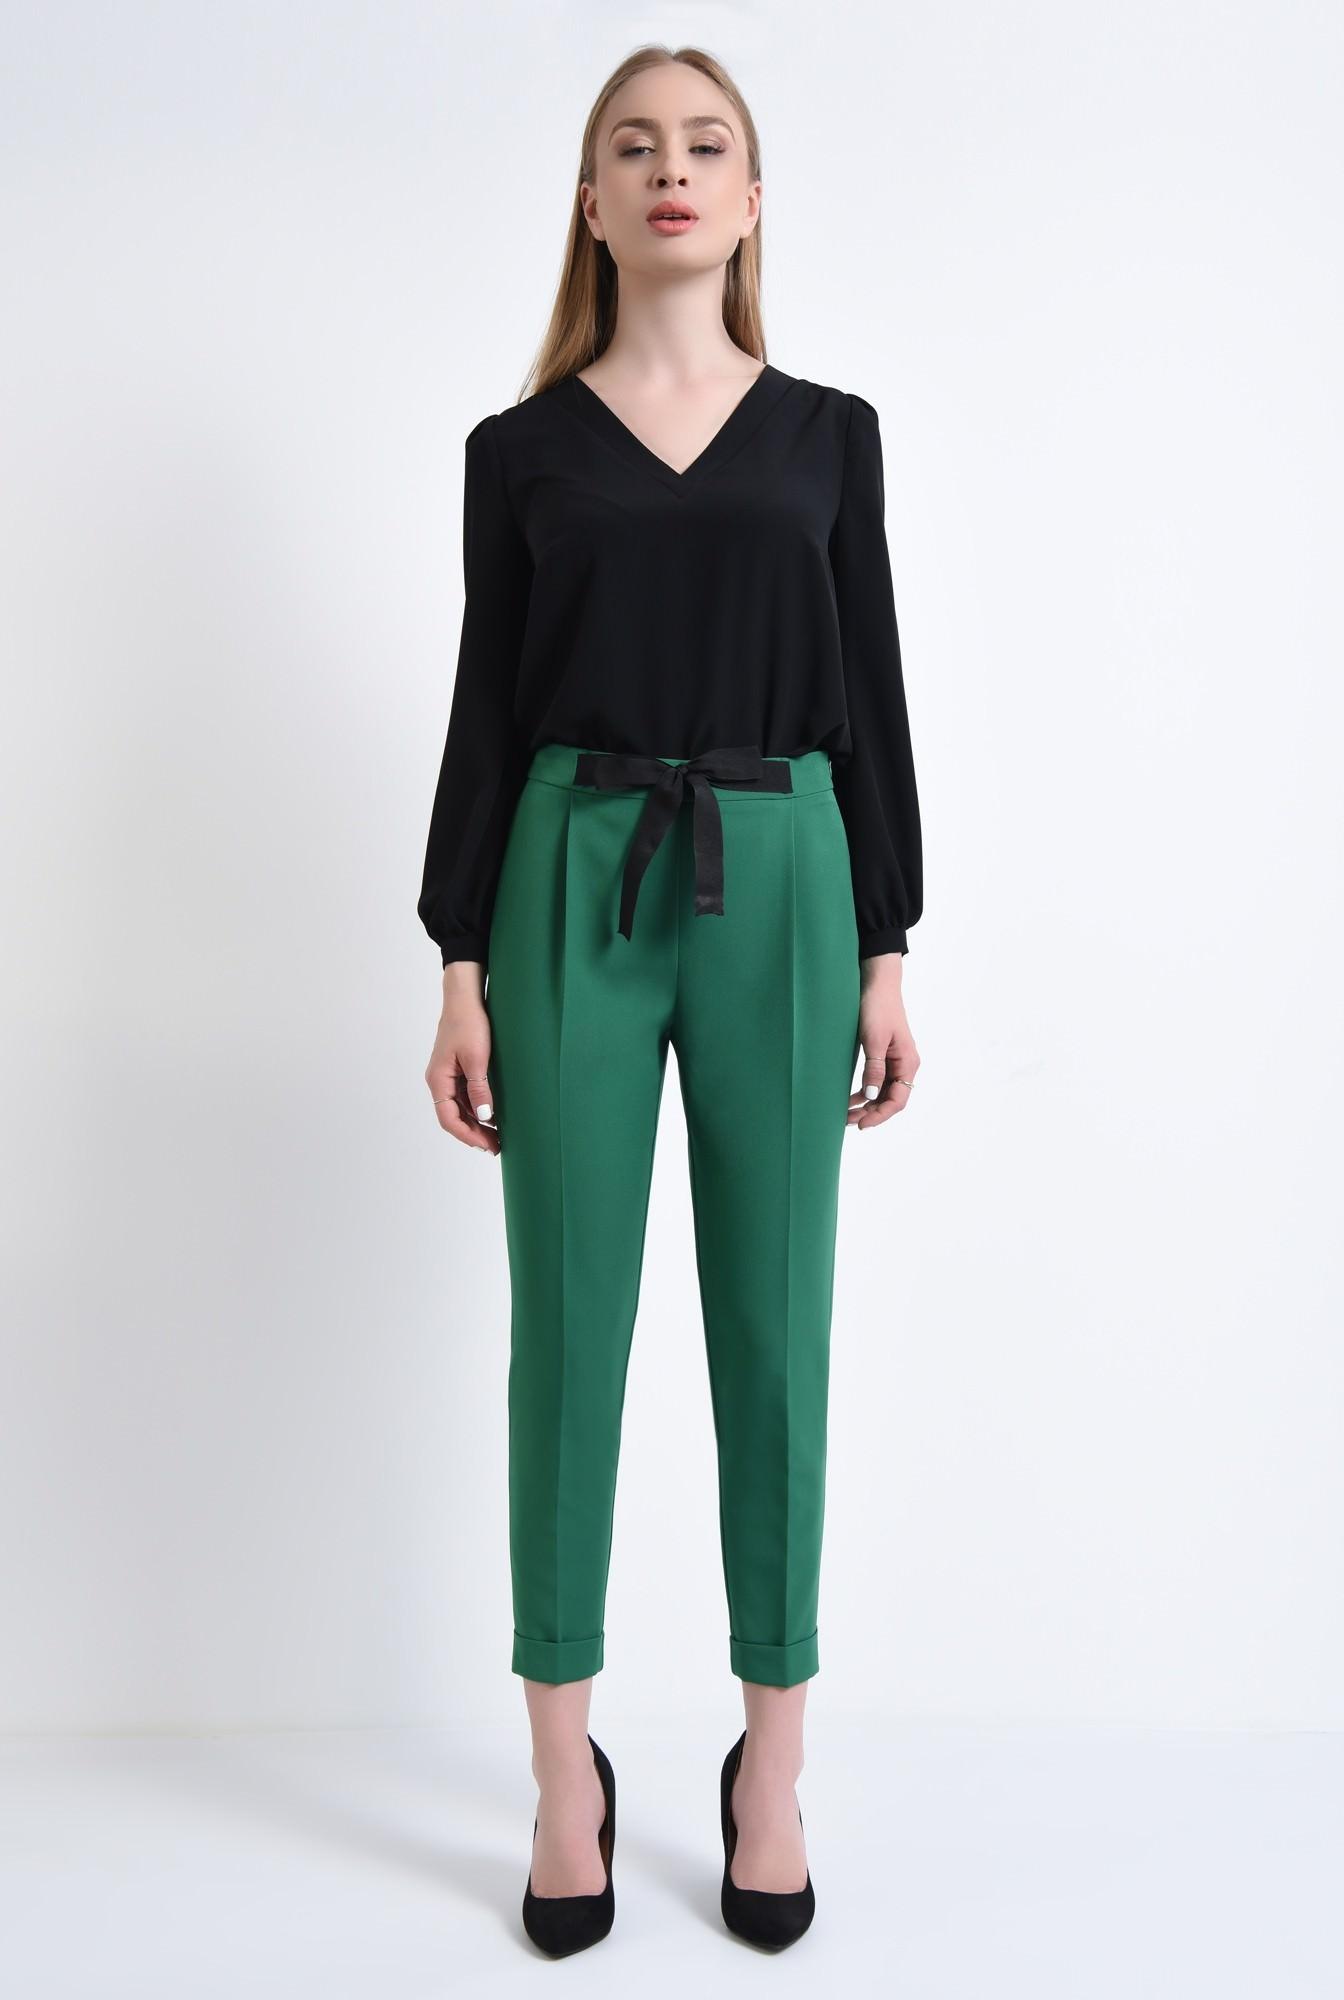 3 - Pantaloni casual, verde